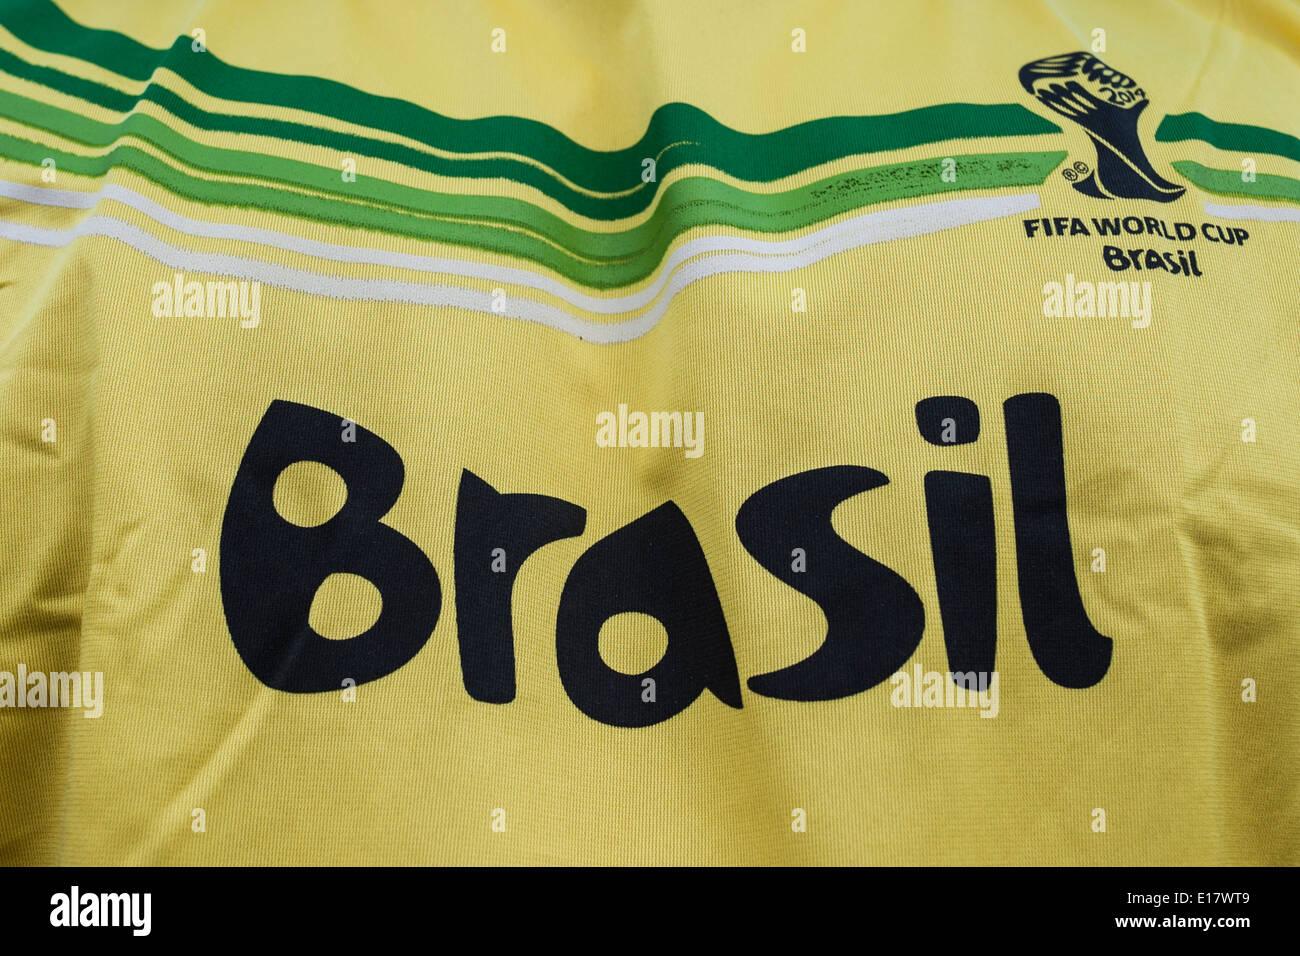 Brazil themed football shirt for Brazil World Cup 2014. Stock Photo